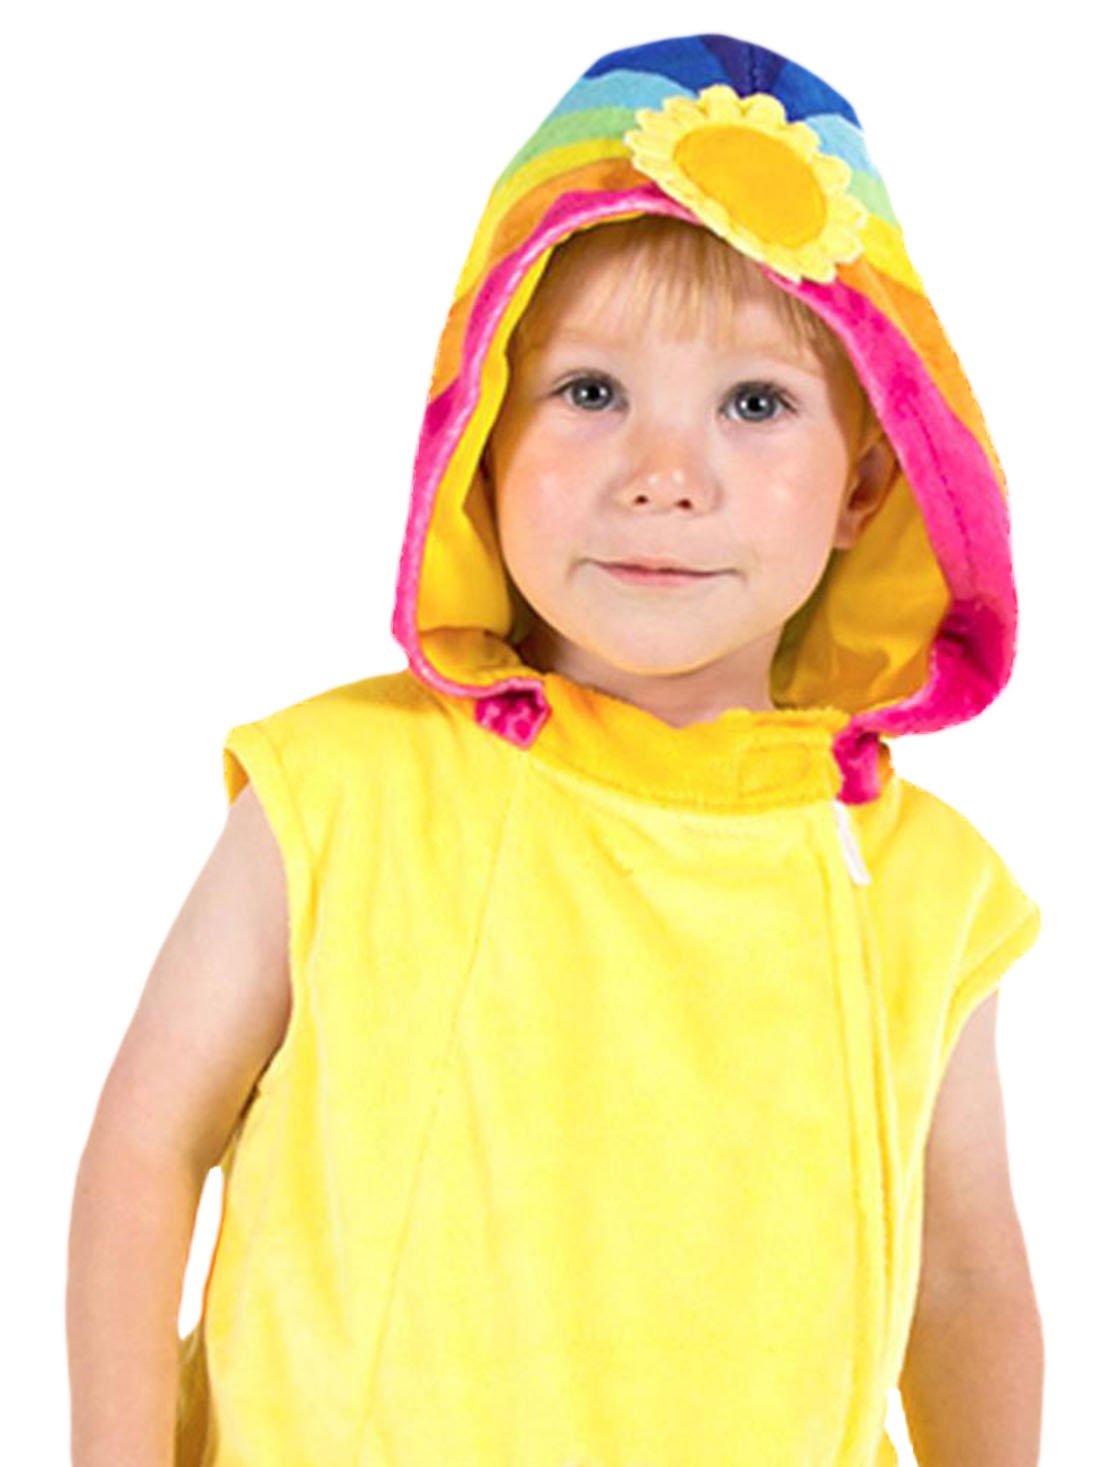 Karnevalsbud - Kinder Wolkenkind Kleid Kostüm Karneval, Gelb, Größe 92-98, 2-3 Jahre